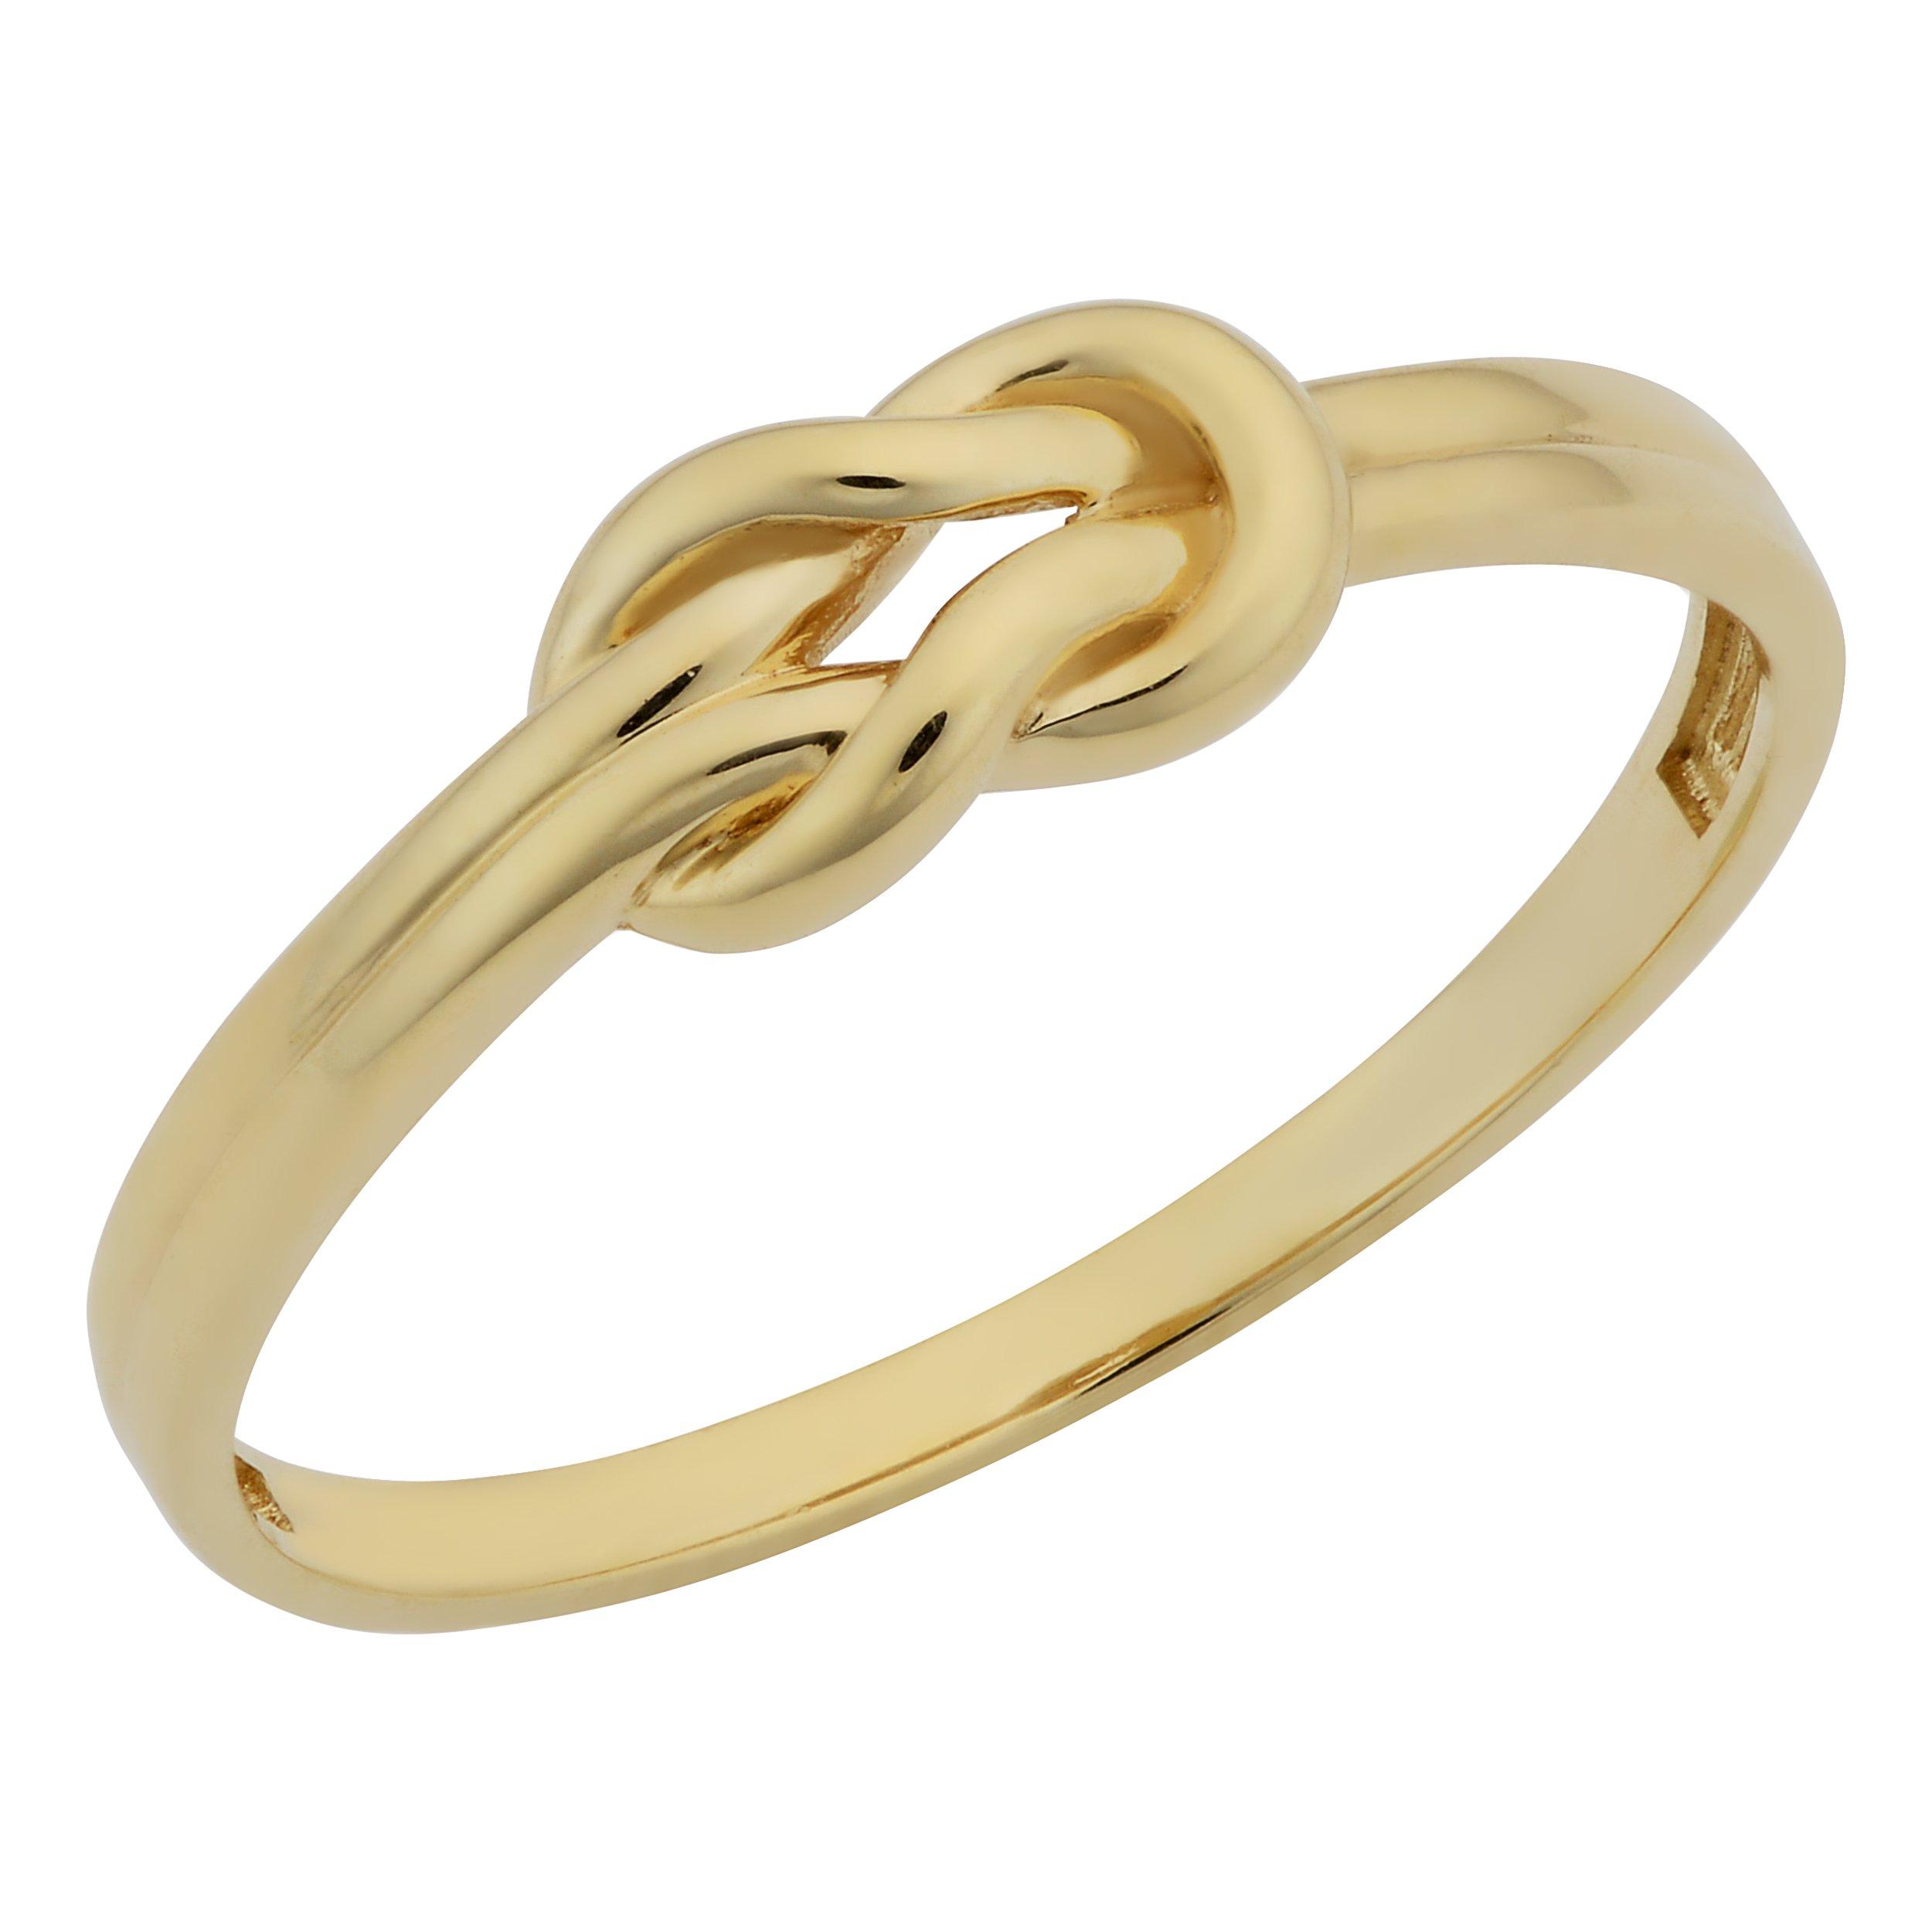 14k Yellow Gold High Polish Love Knot Ring (size 8)